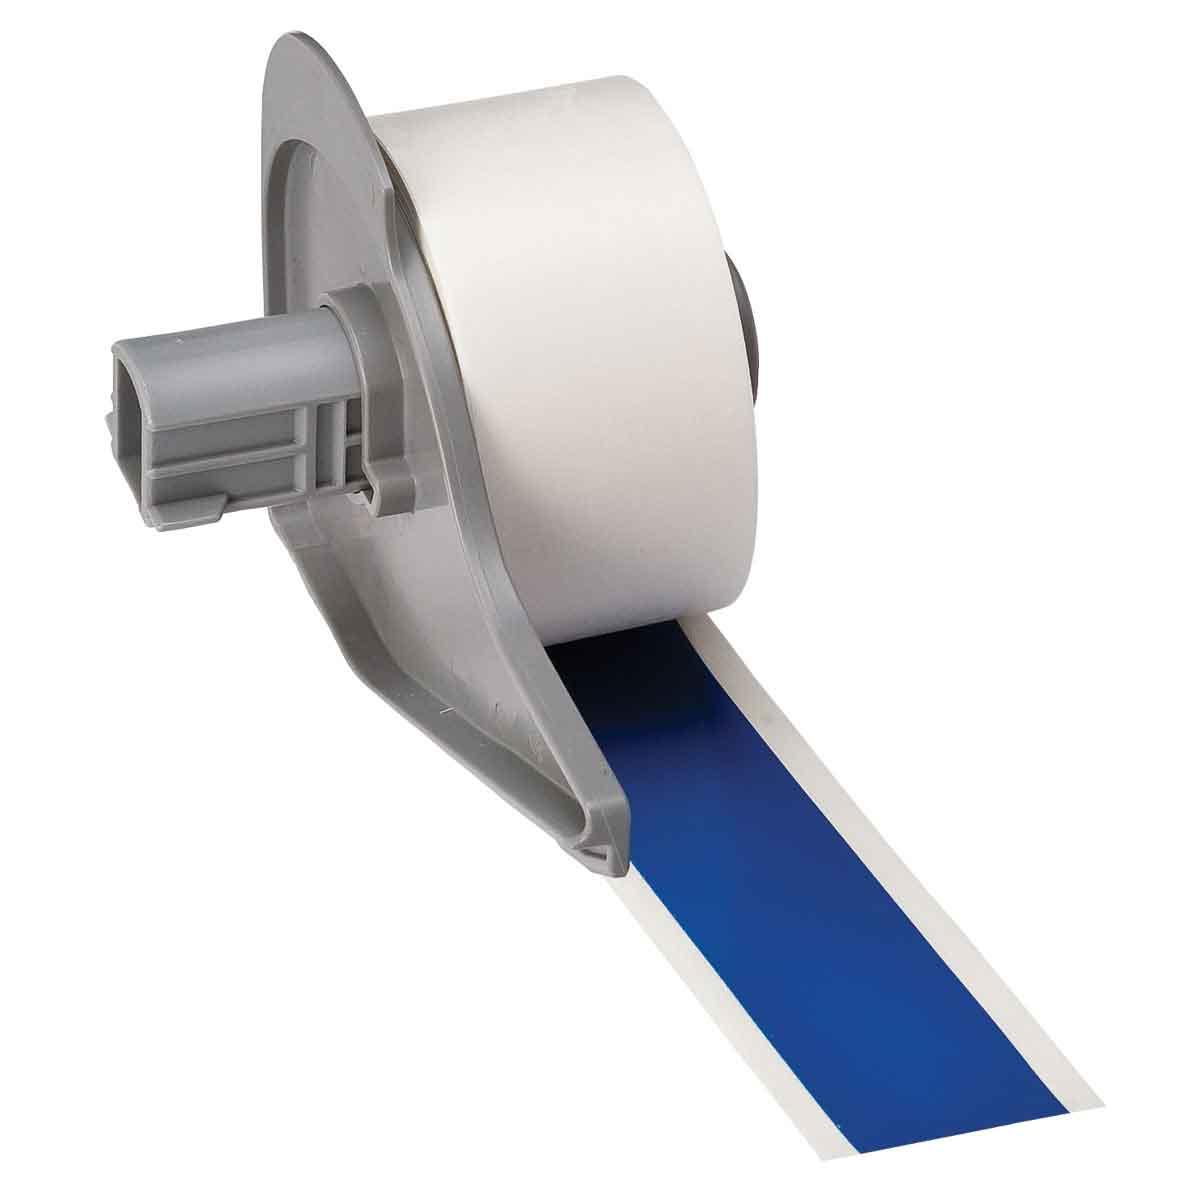 Brady® M71C-1000-595-BL Blank Thermal Transfer Tape, 50 ft L x 1 in W, Blue, B-595 Vinyl, Permanent Acrylic Adhesive, -40 to 180 deg F